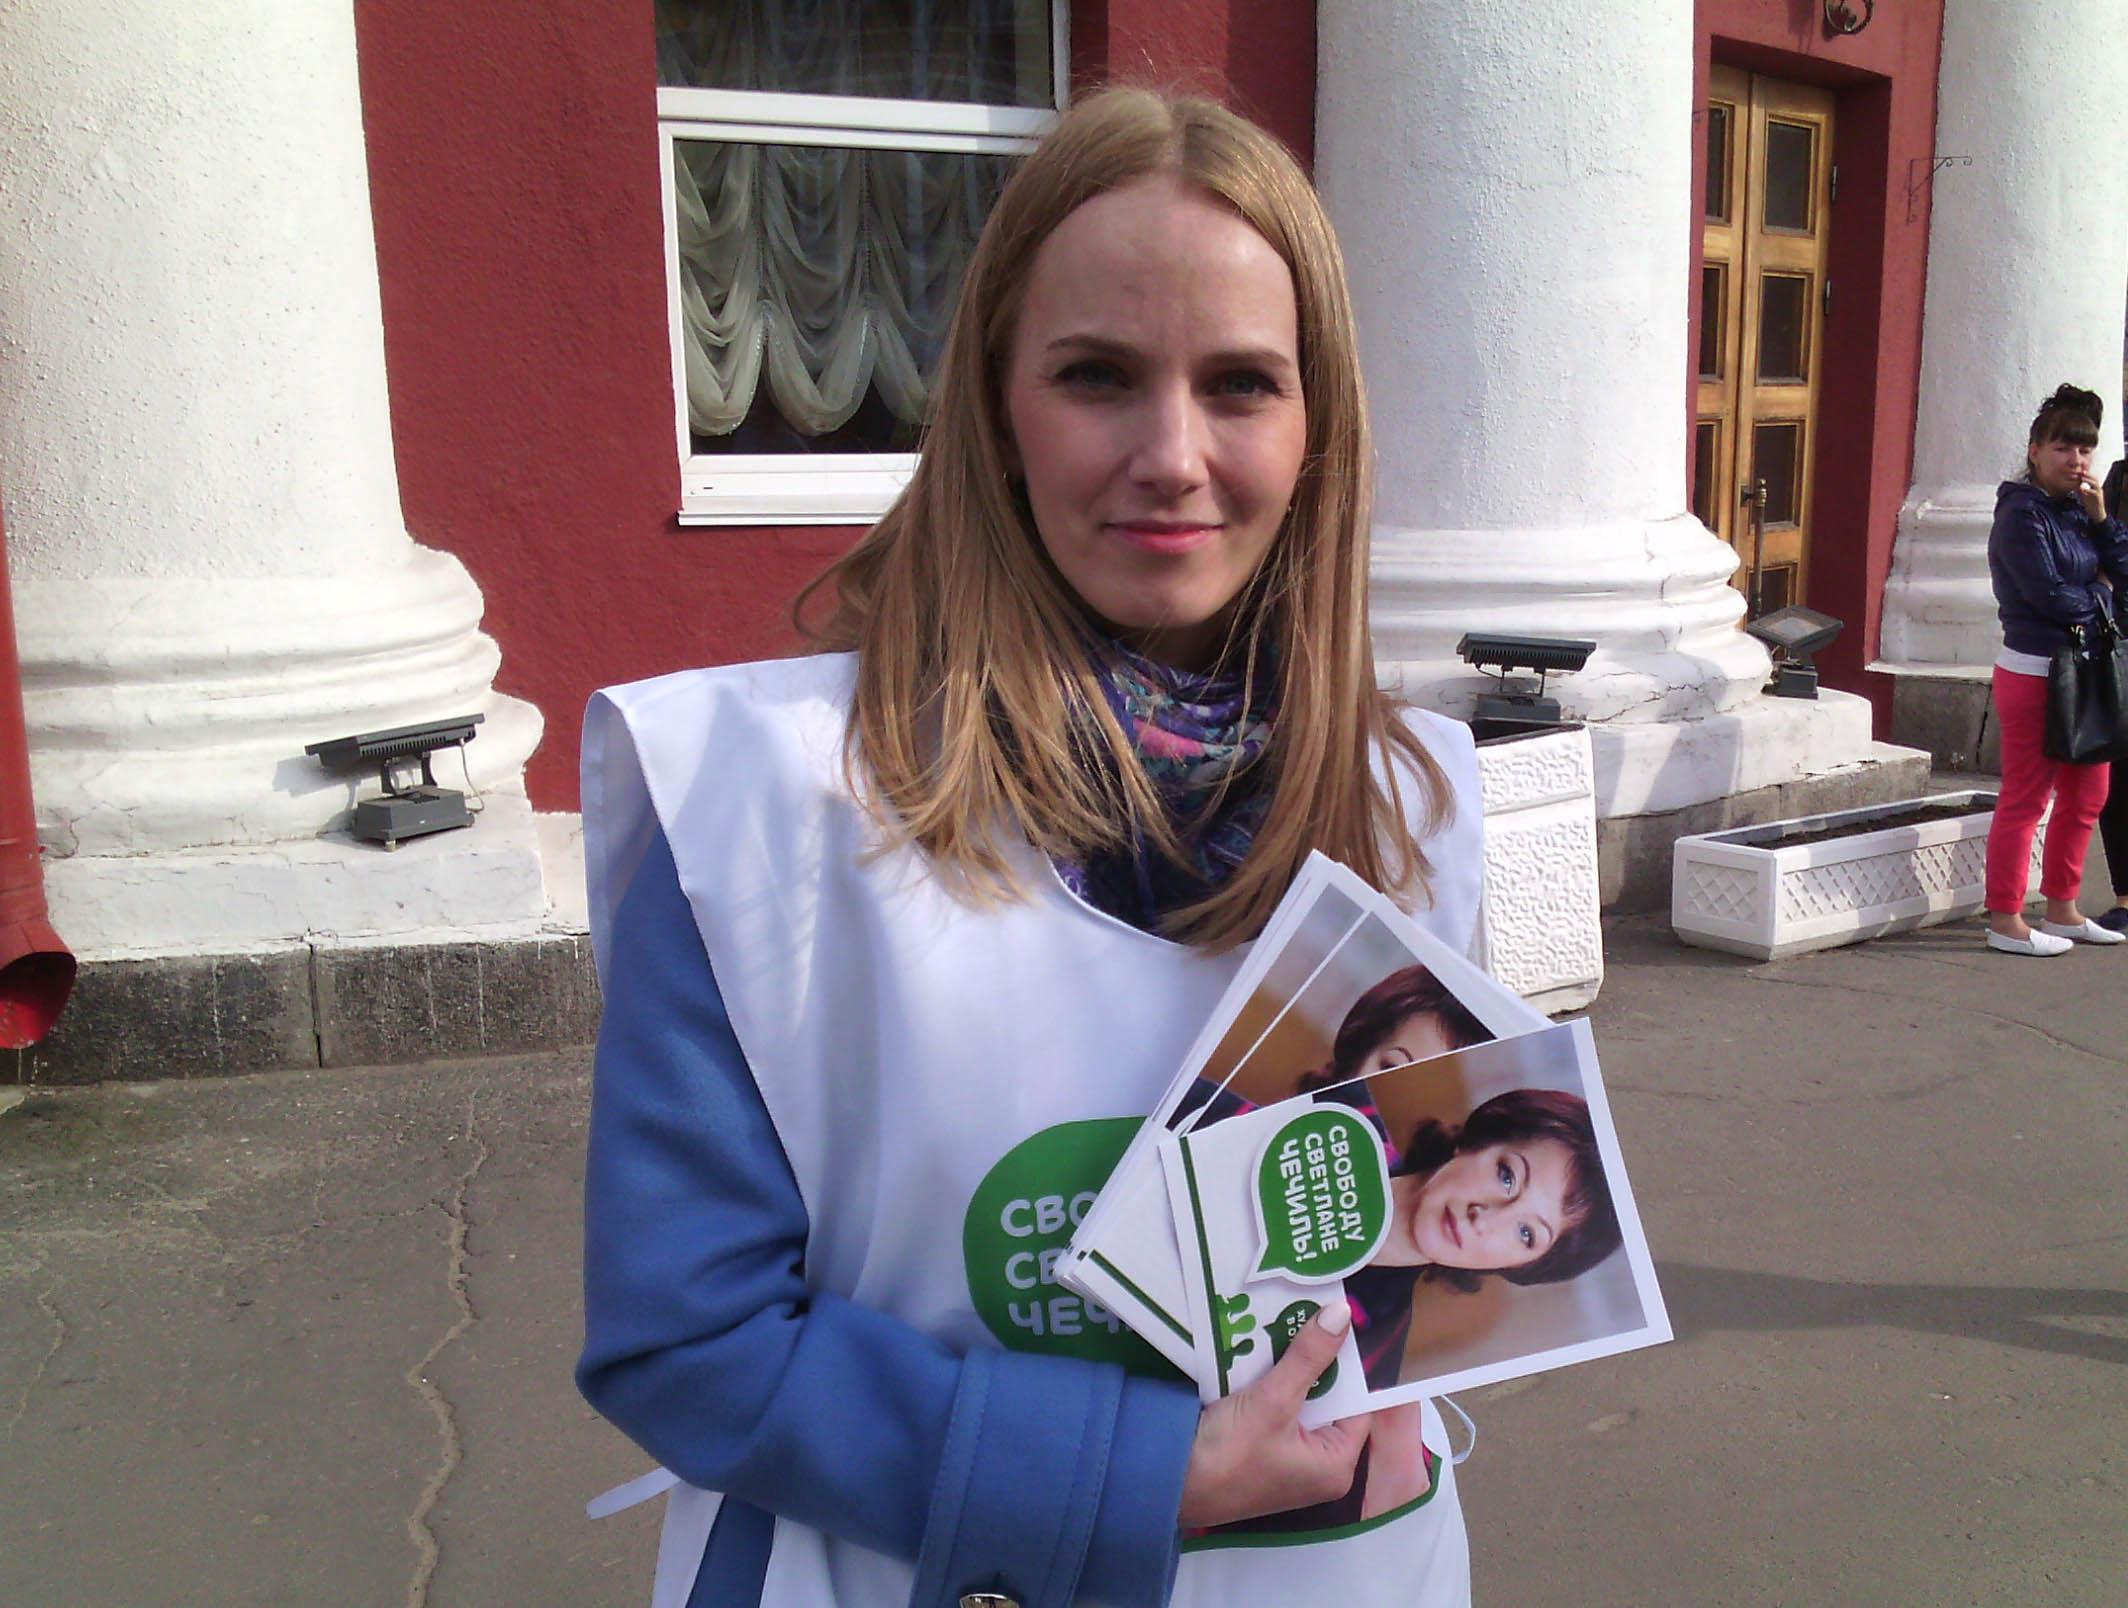 Депутат парламента Карелии Анастасия Кравчук. Фото: Валерий Поташов